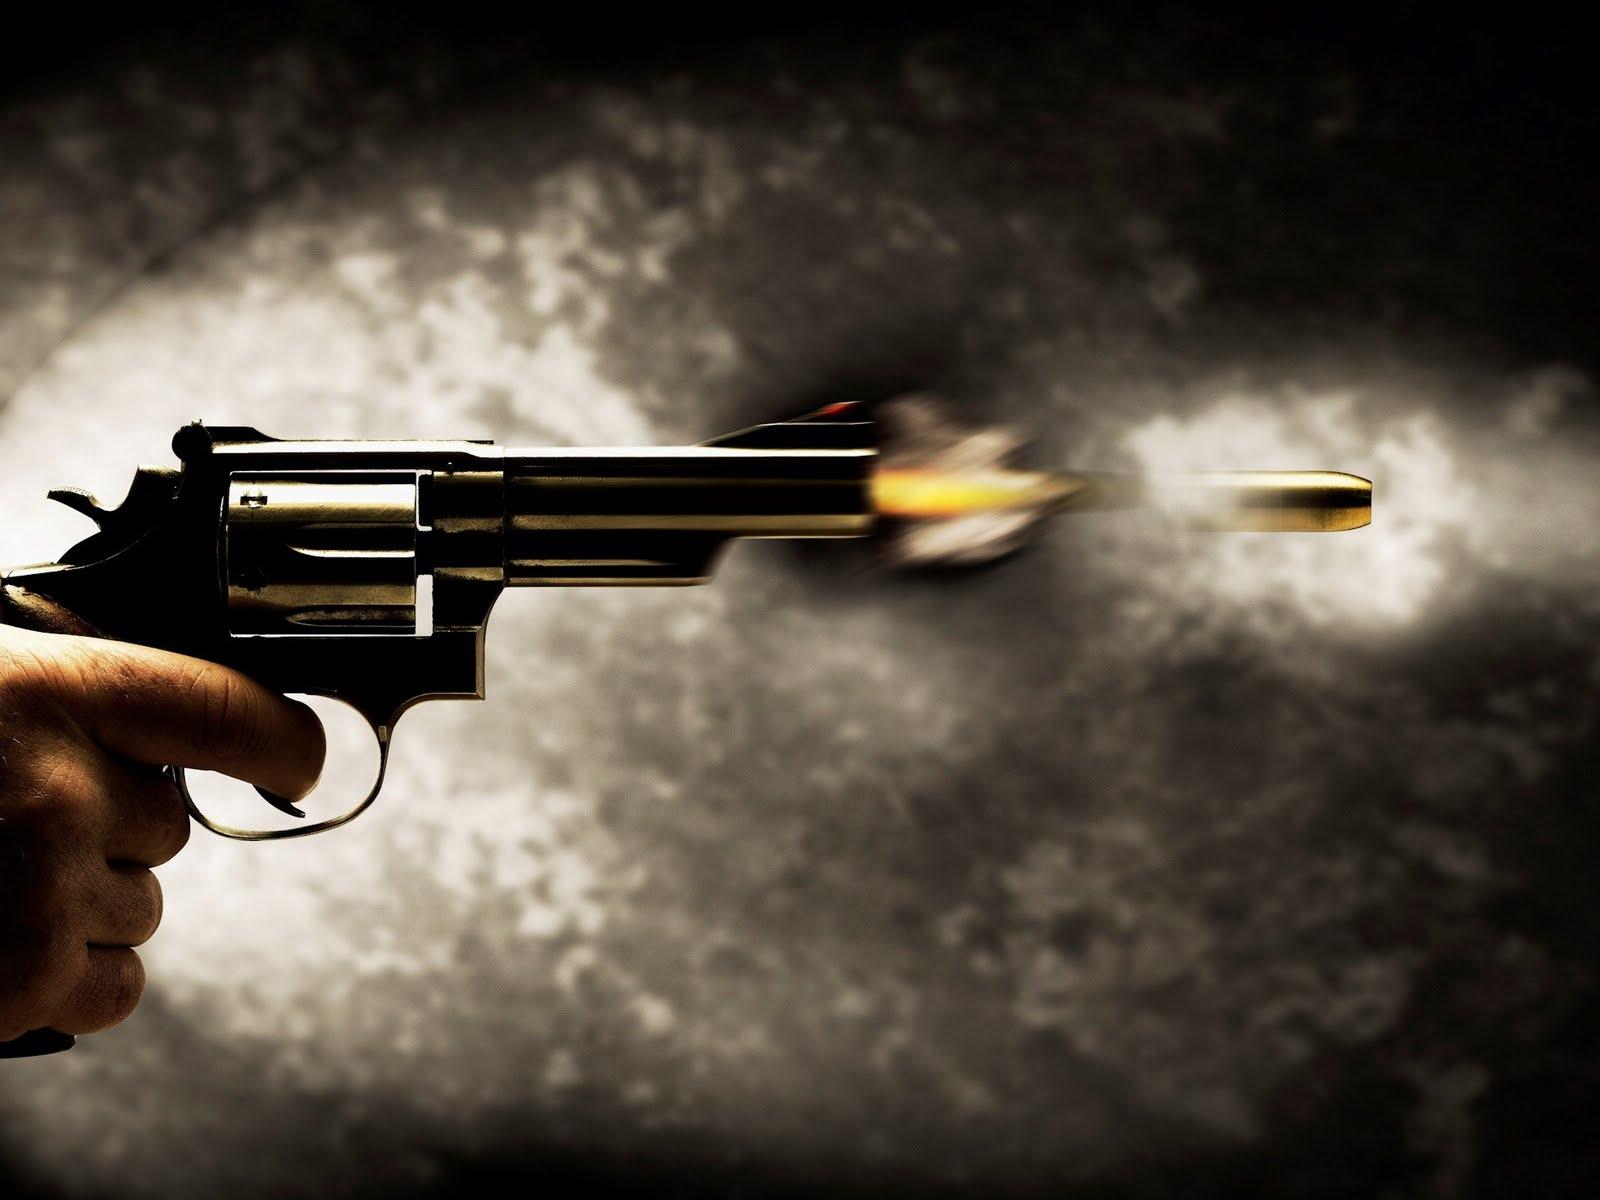 pistola-fumante-donald-trump-impeachment